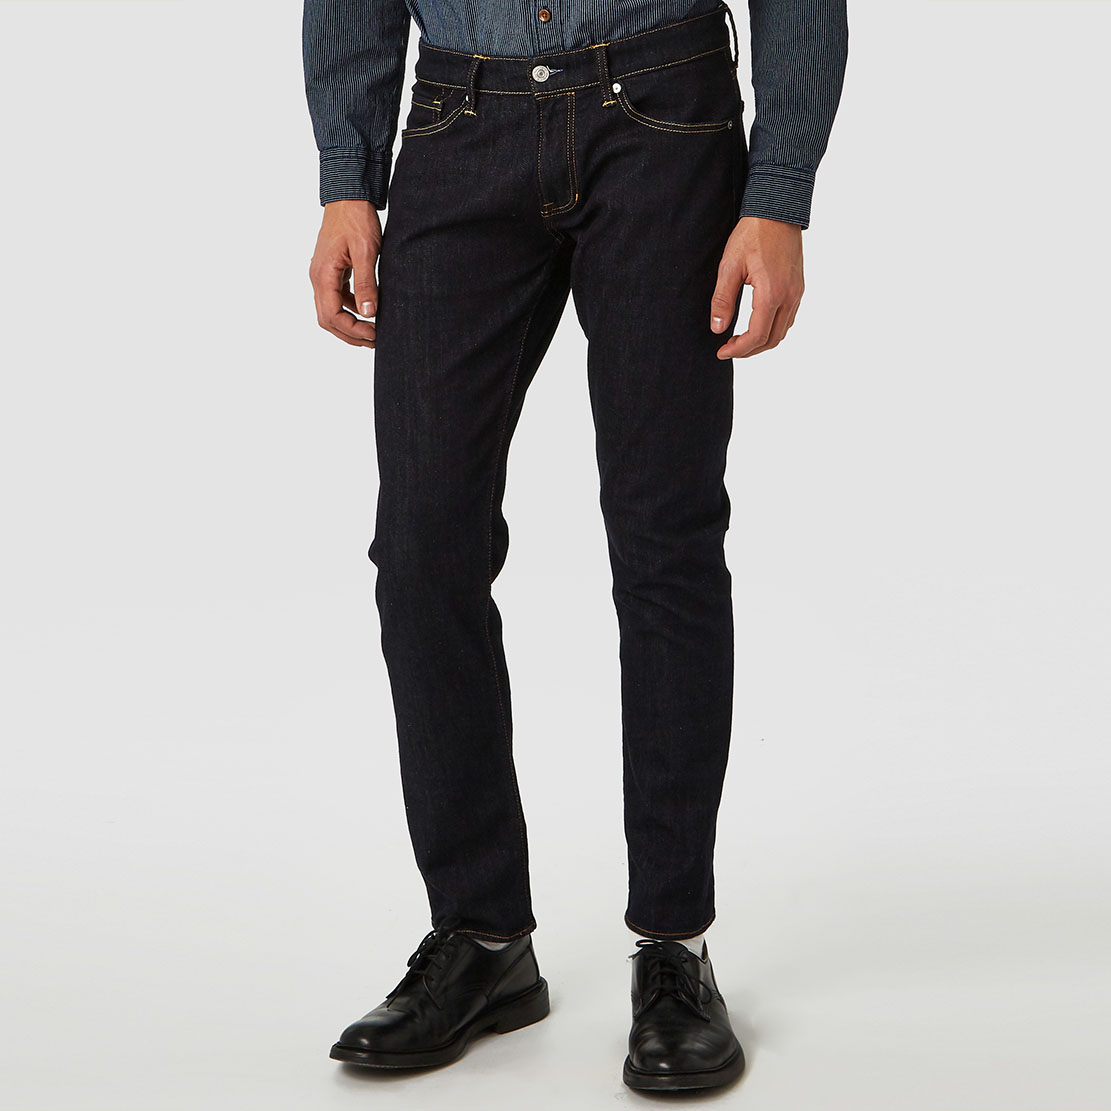 Charles Rinse ekologiska jeans herr från KOI - Kings of Indigo. Slimfit, mid rise & tapered fit.